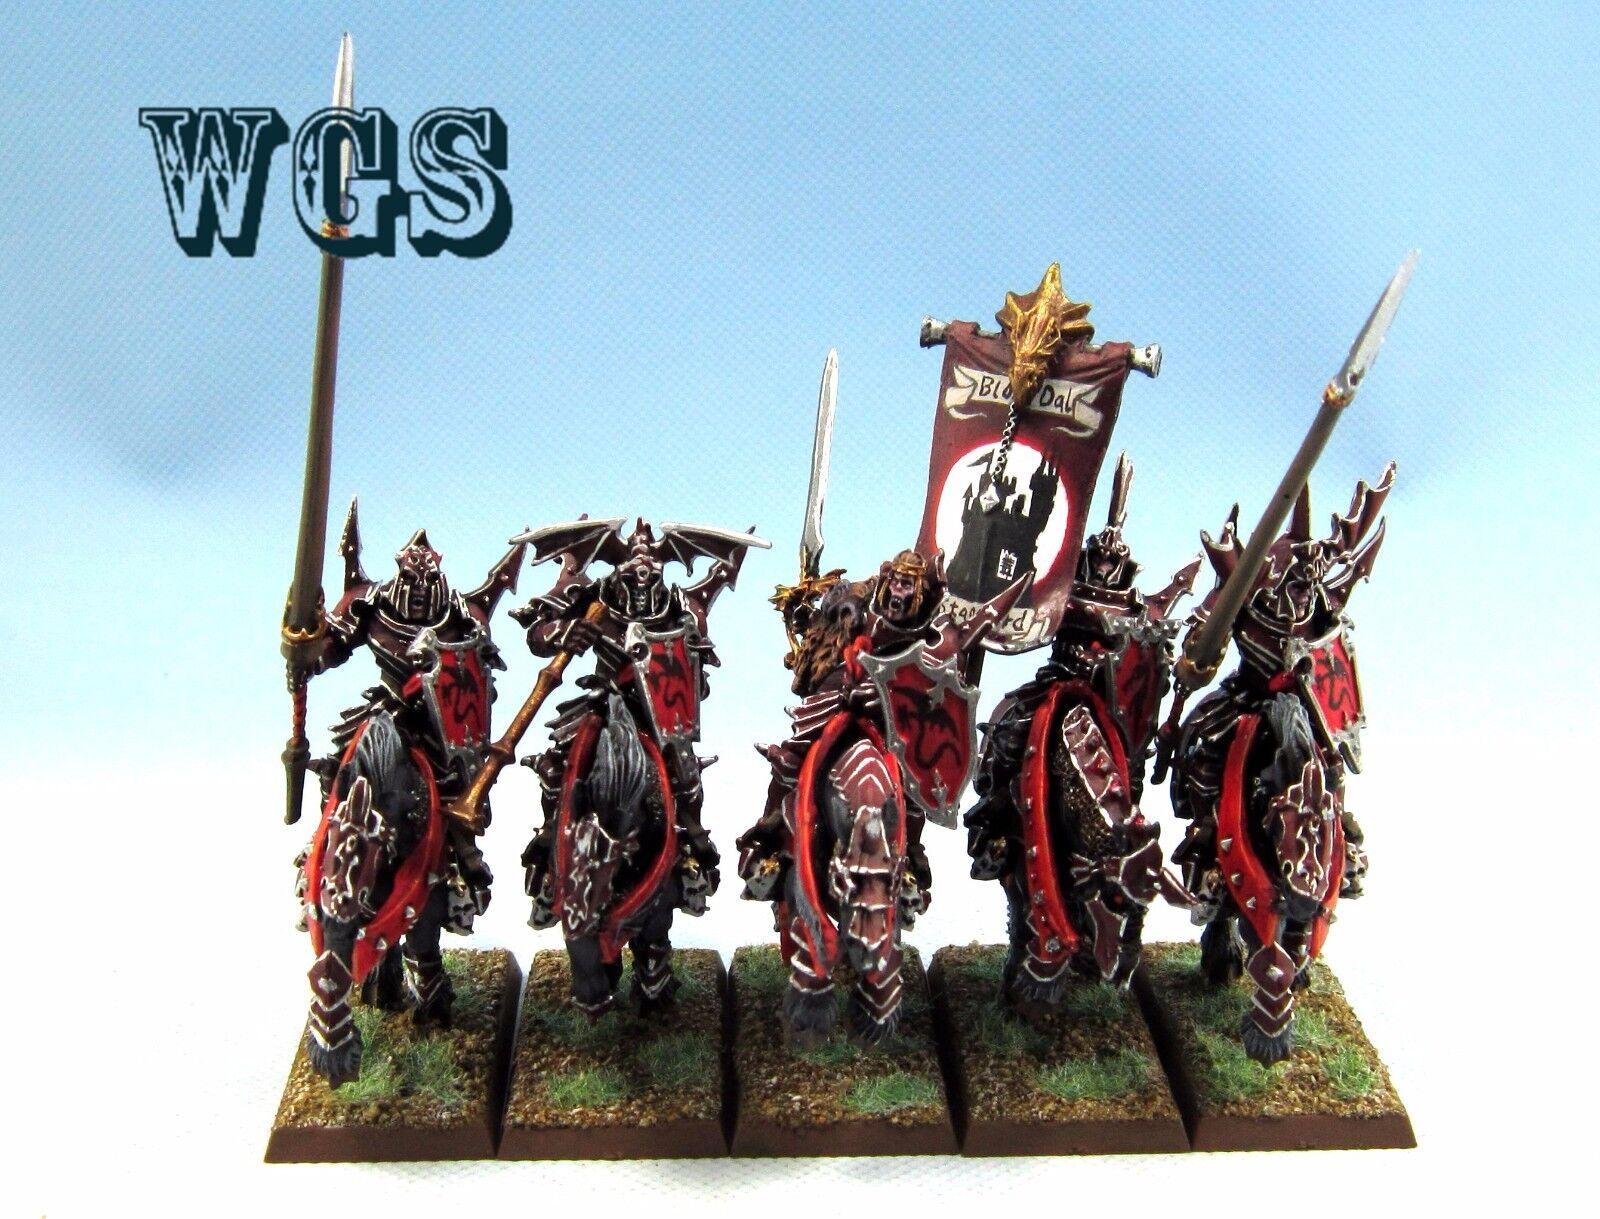 25 mm Warhammer WGS  peint VAMPIRE COUNTS Blood kninghts VC036  10 jours de retour